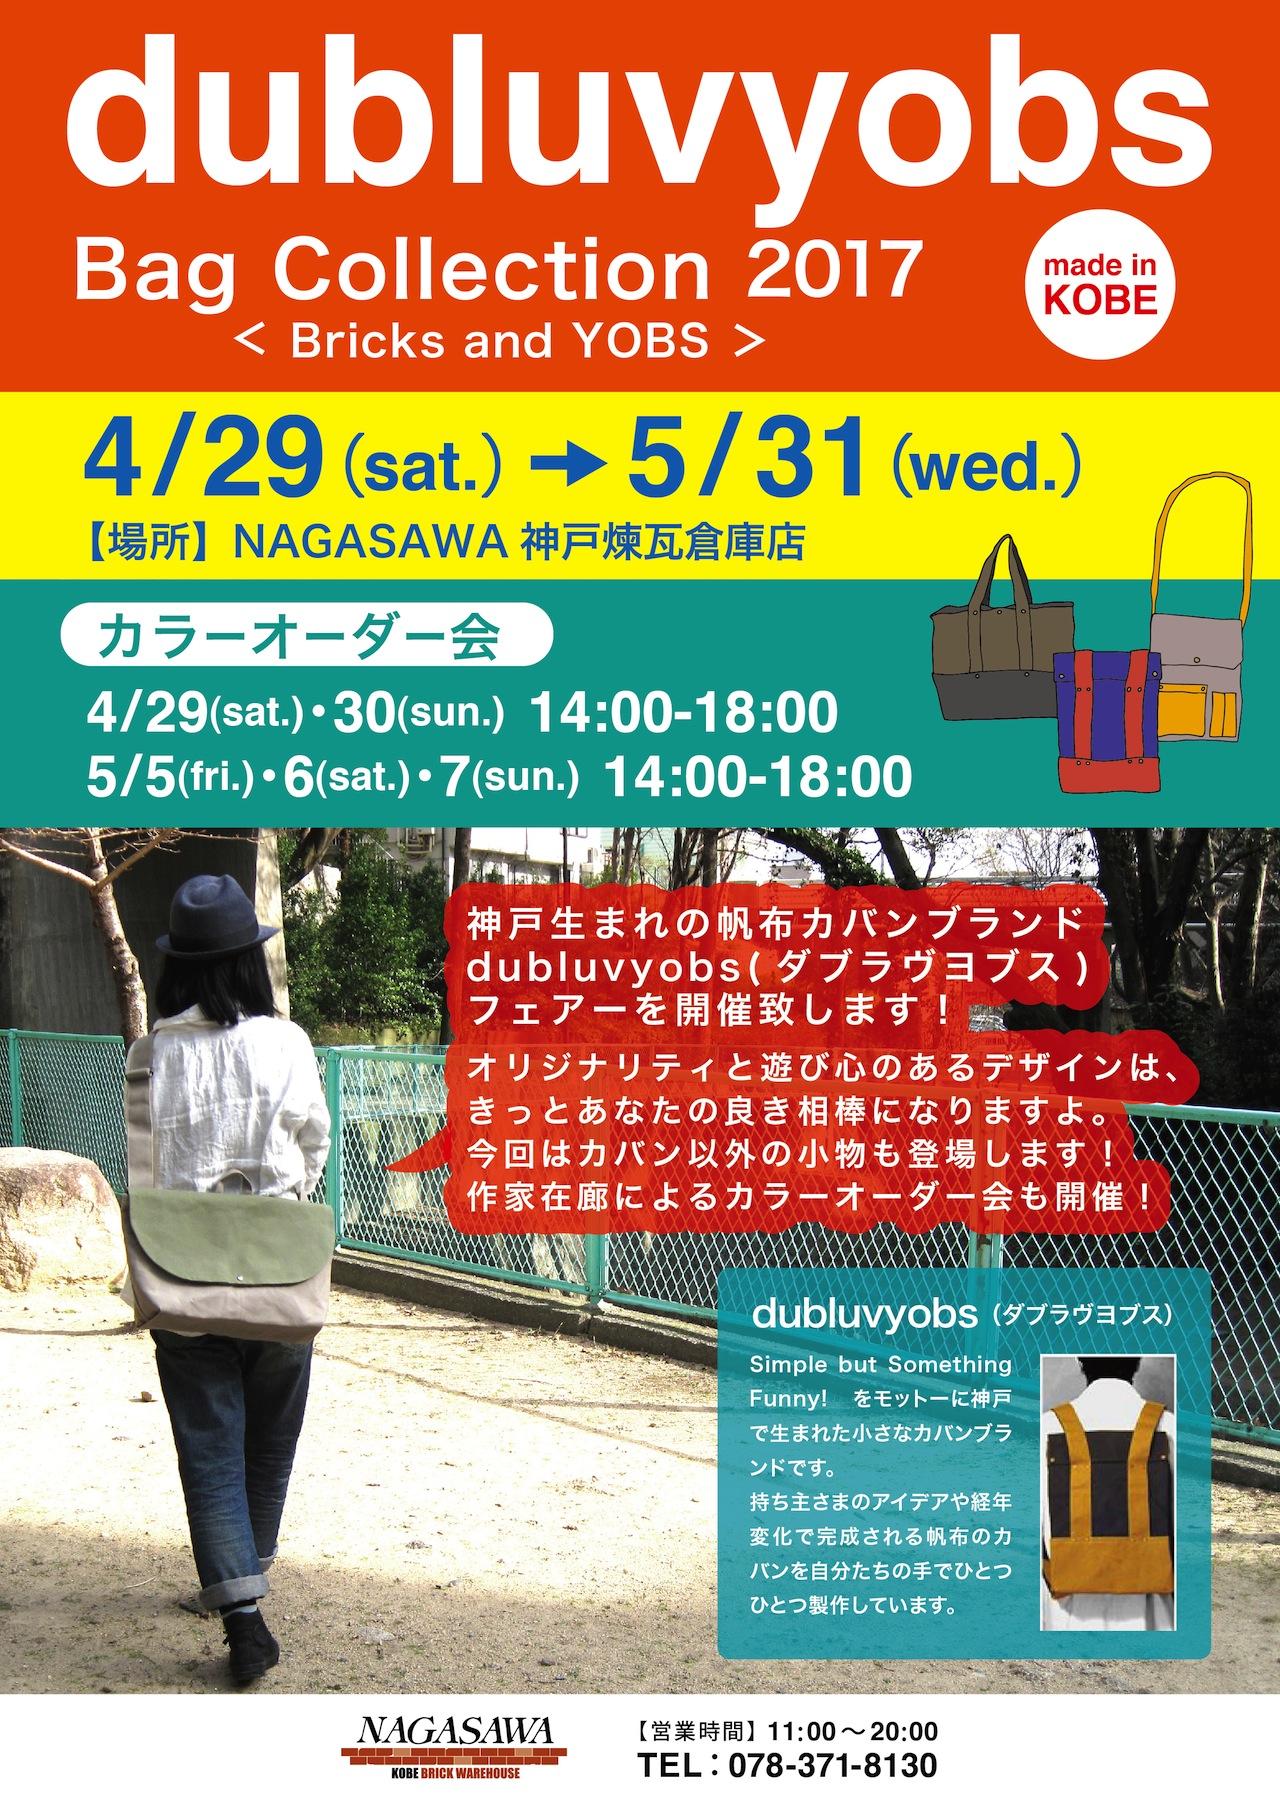 dubluvyobs(ダブラヴヨブス)バッグコレクション2017 @NAGASAWA神戸煉瓦倉庫店